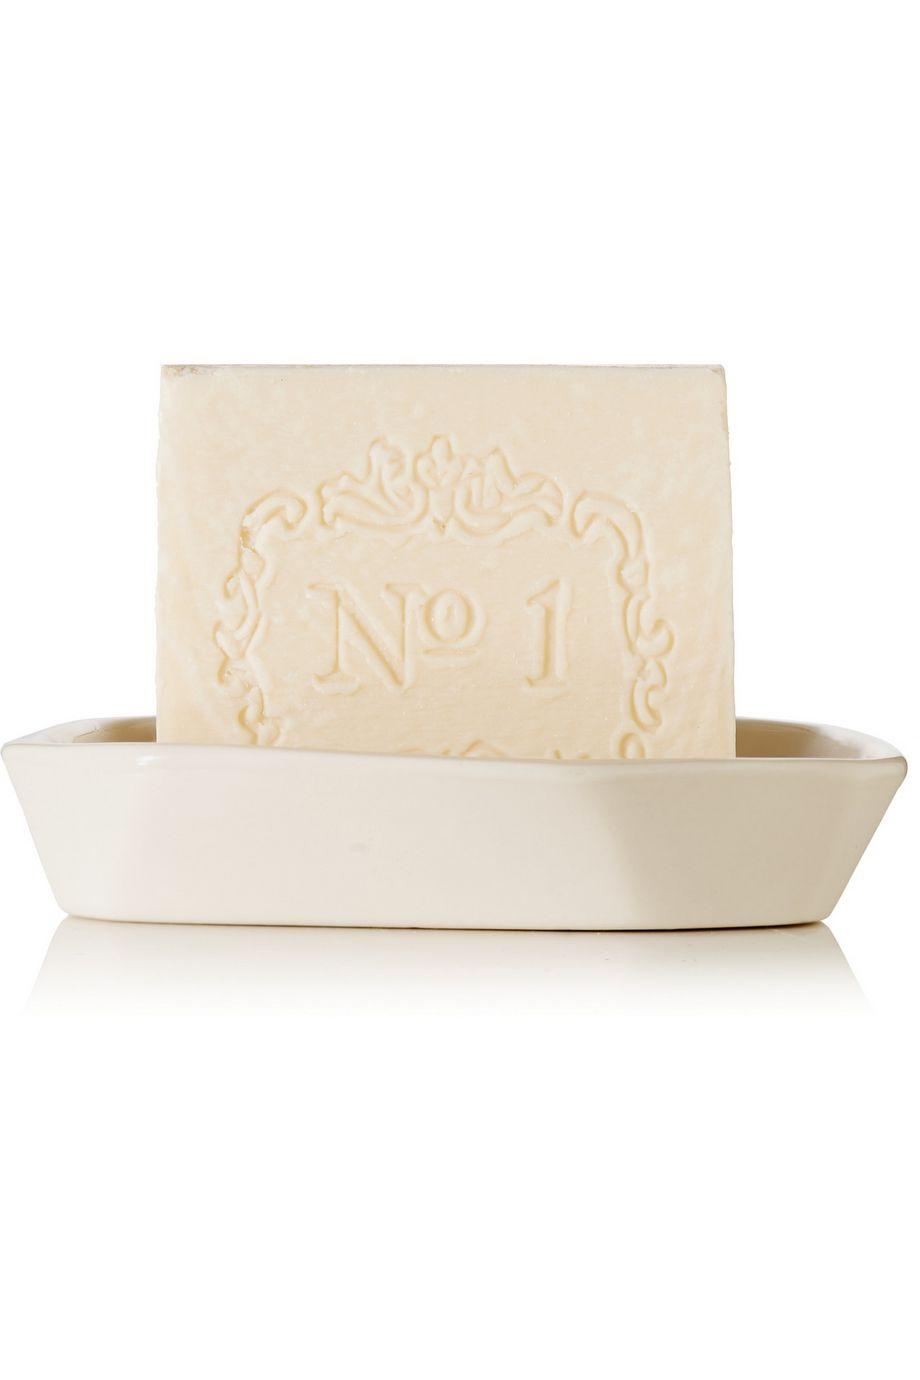 Joya Composition No. 1 Soap & Tray